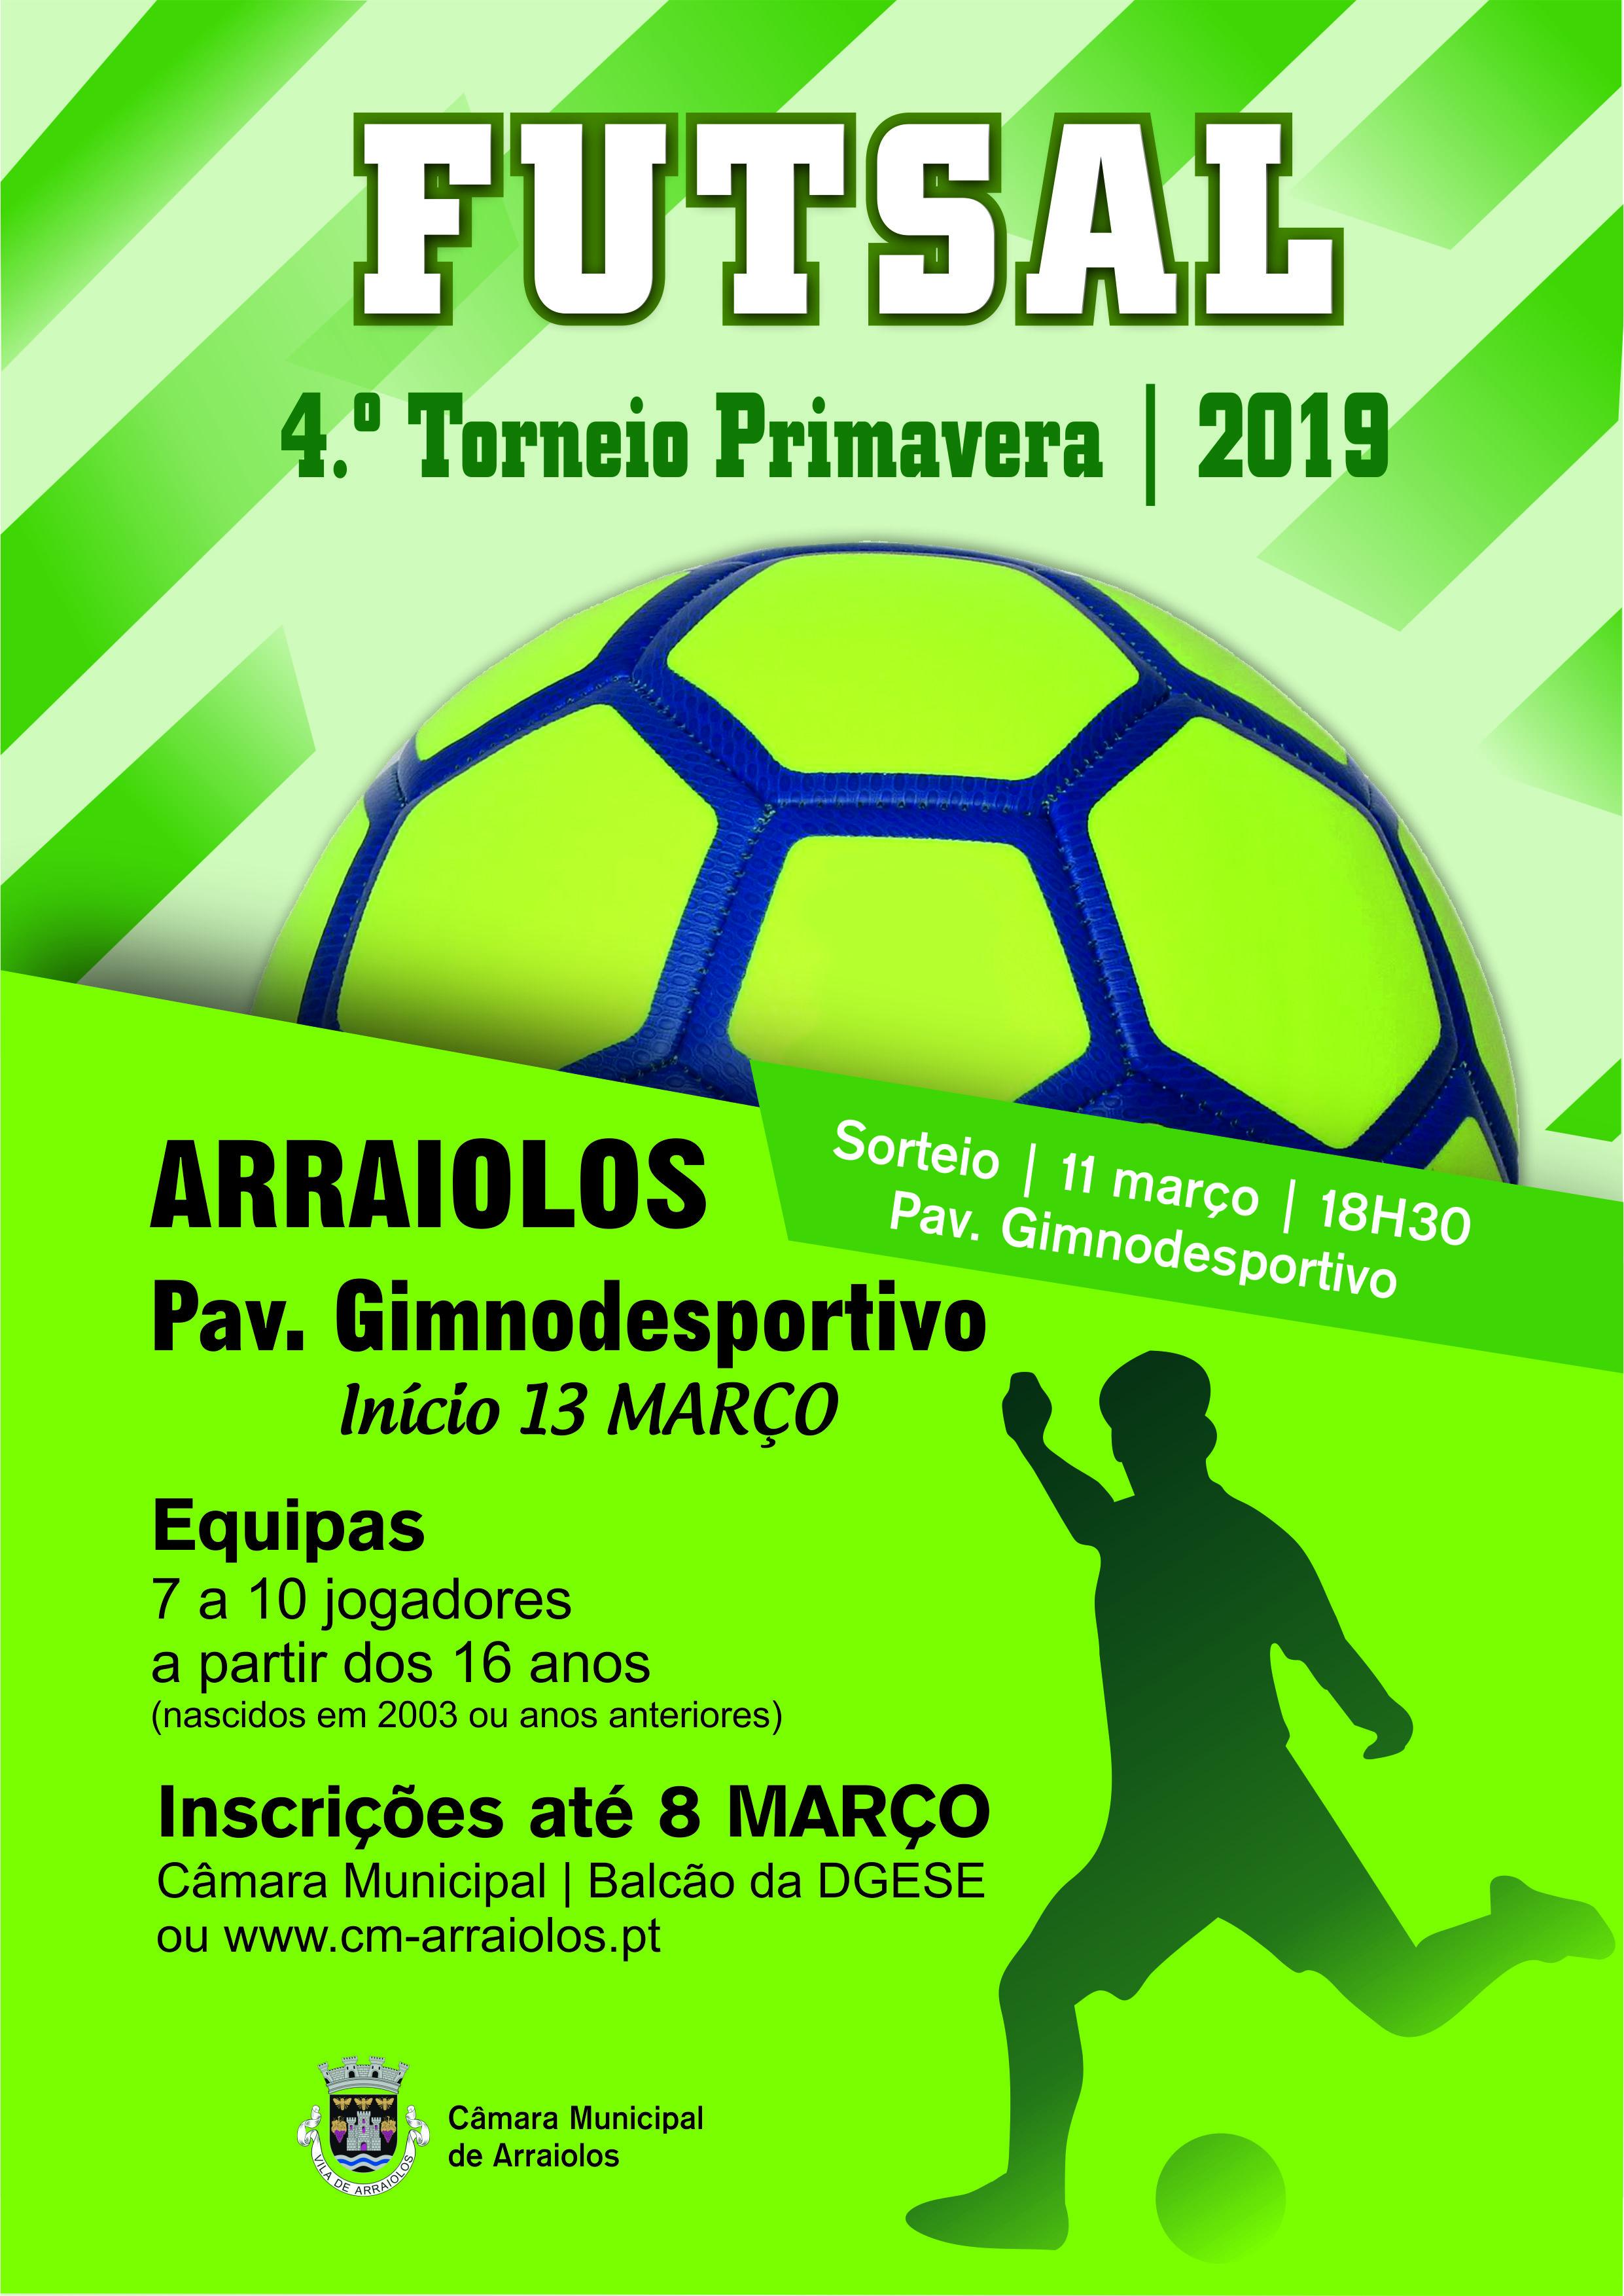 Futsal 4 torneio primavera.jpg